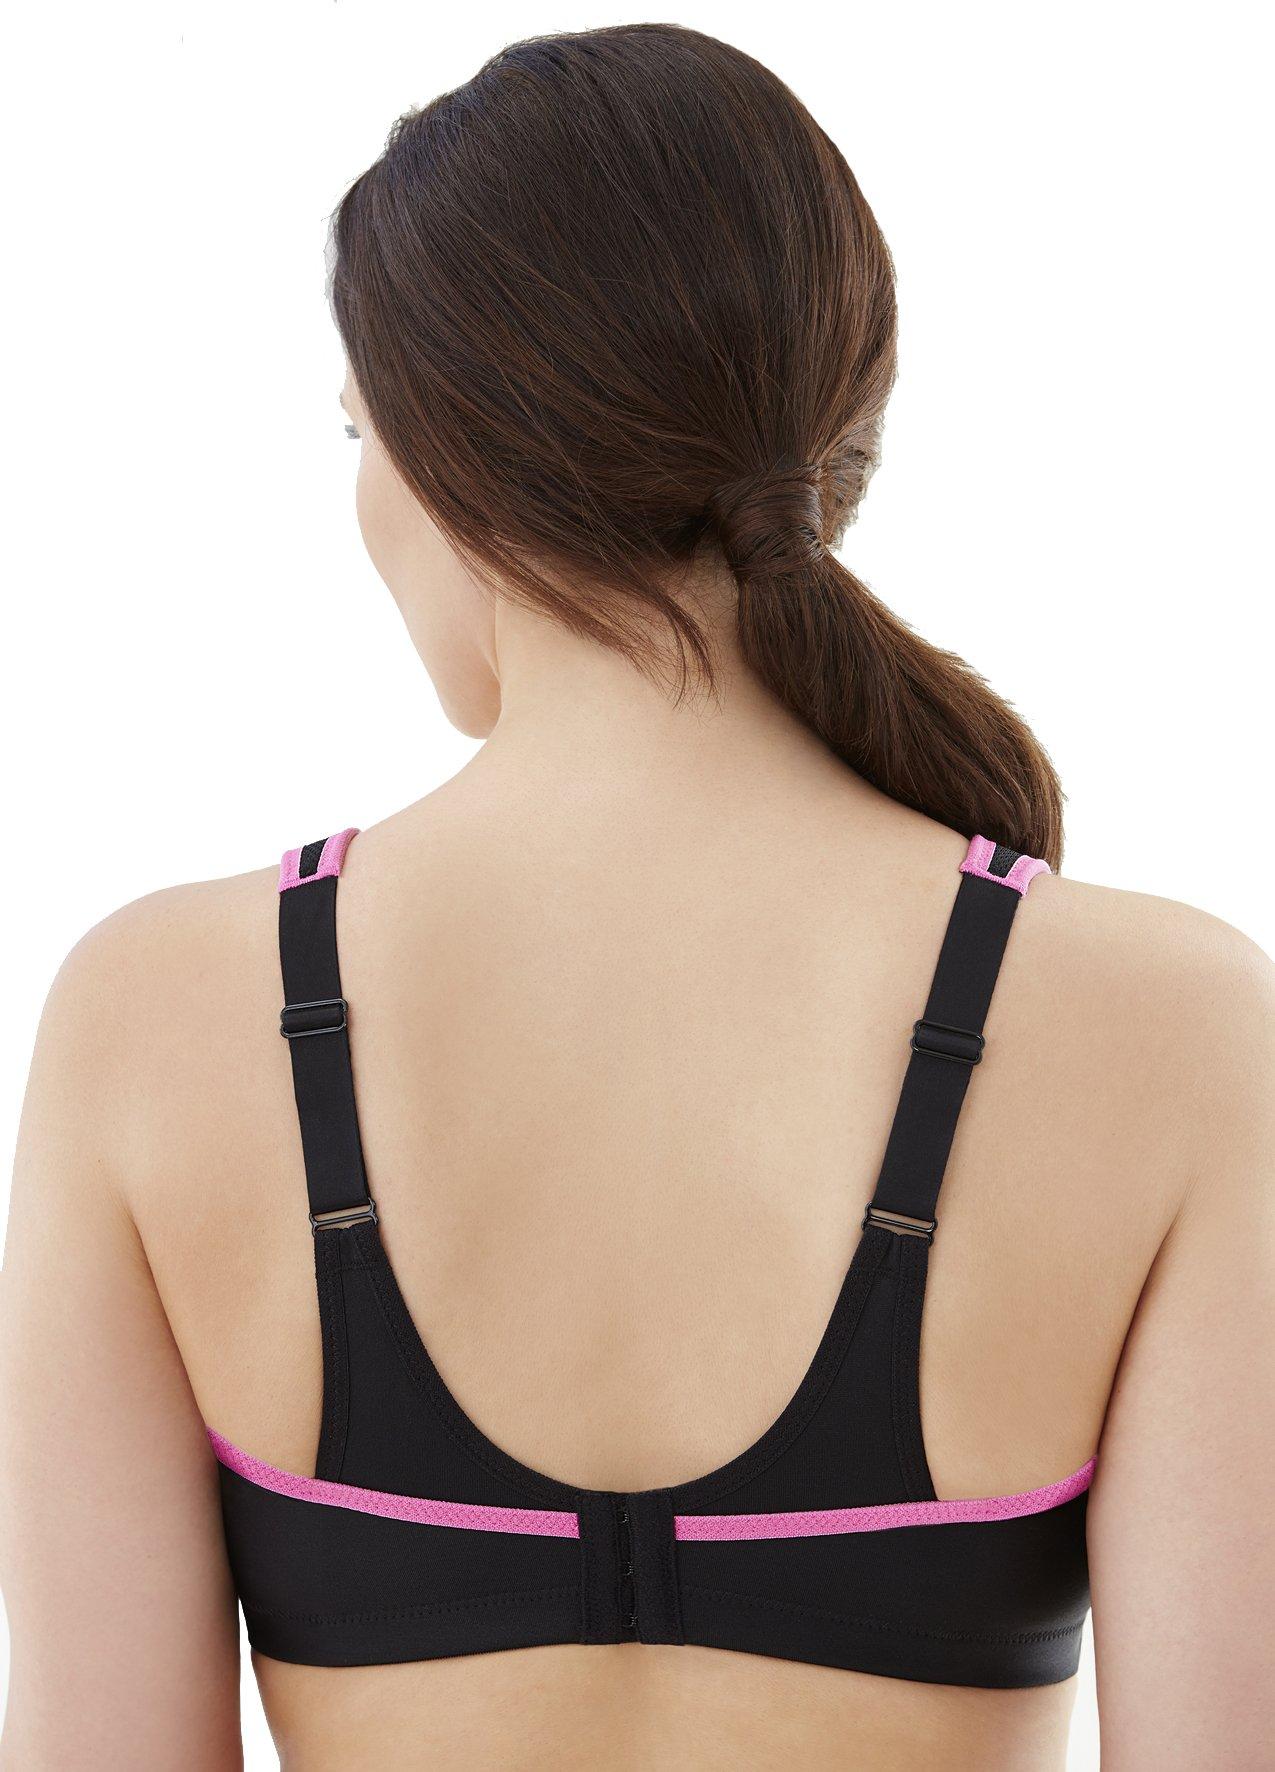 Glamorise Women's Full Figure No Bounce Cami Sport Bra, Black/Pink, 36DD by Glamorise (Image #2)